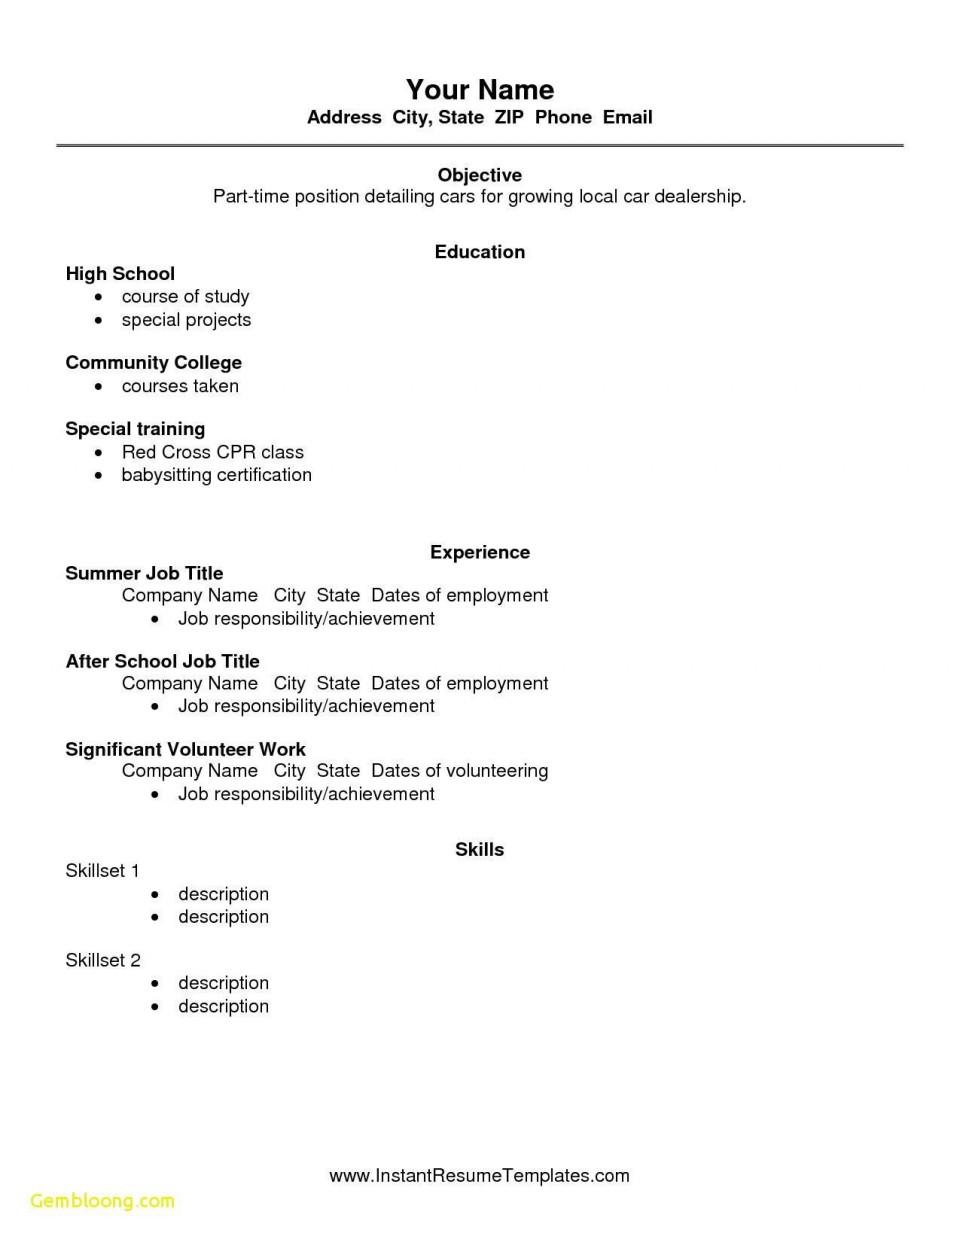 002 Impressive Free High School Resume Template Microsoft Word Highest Clarity 960